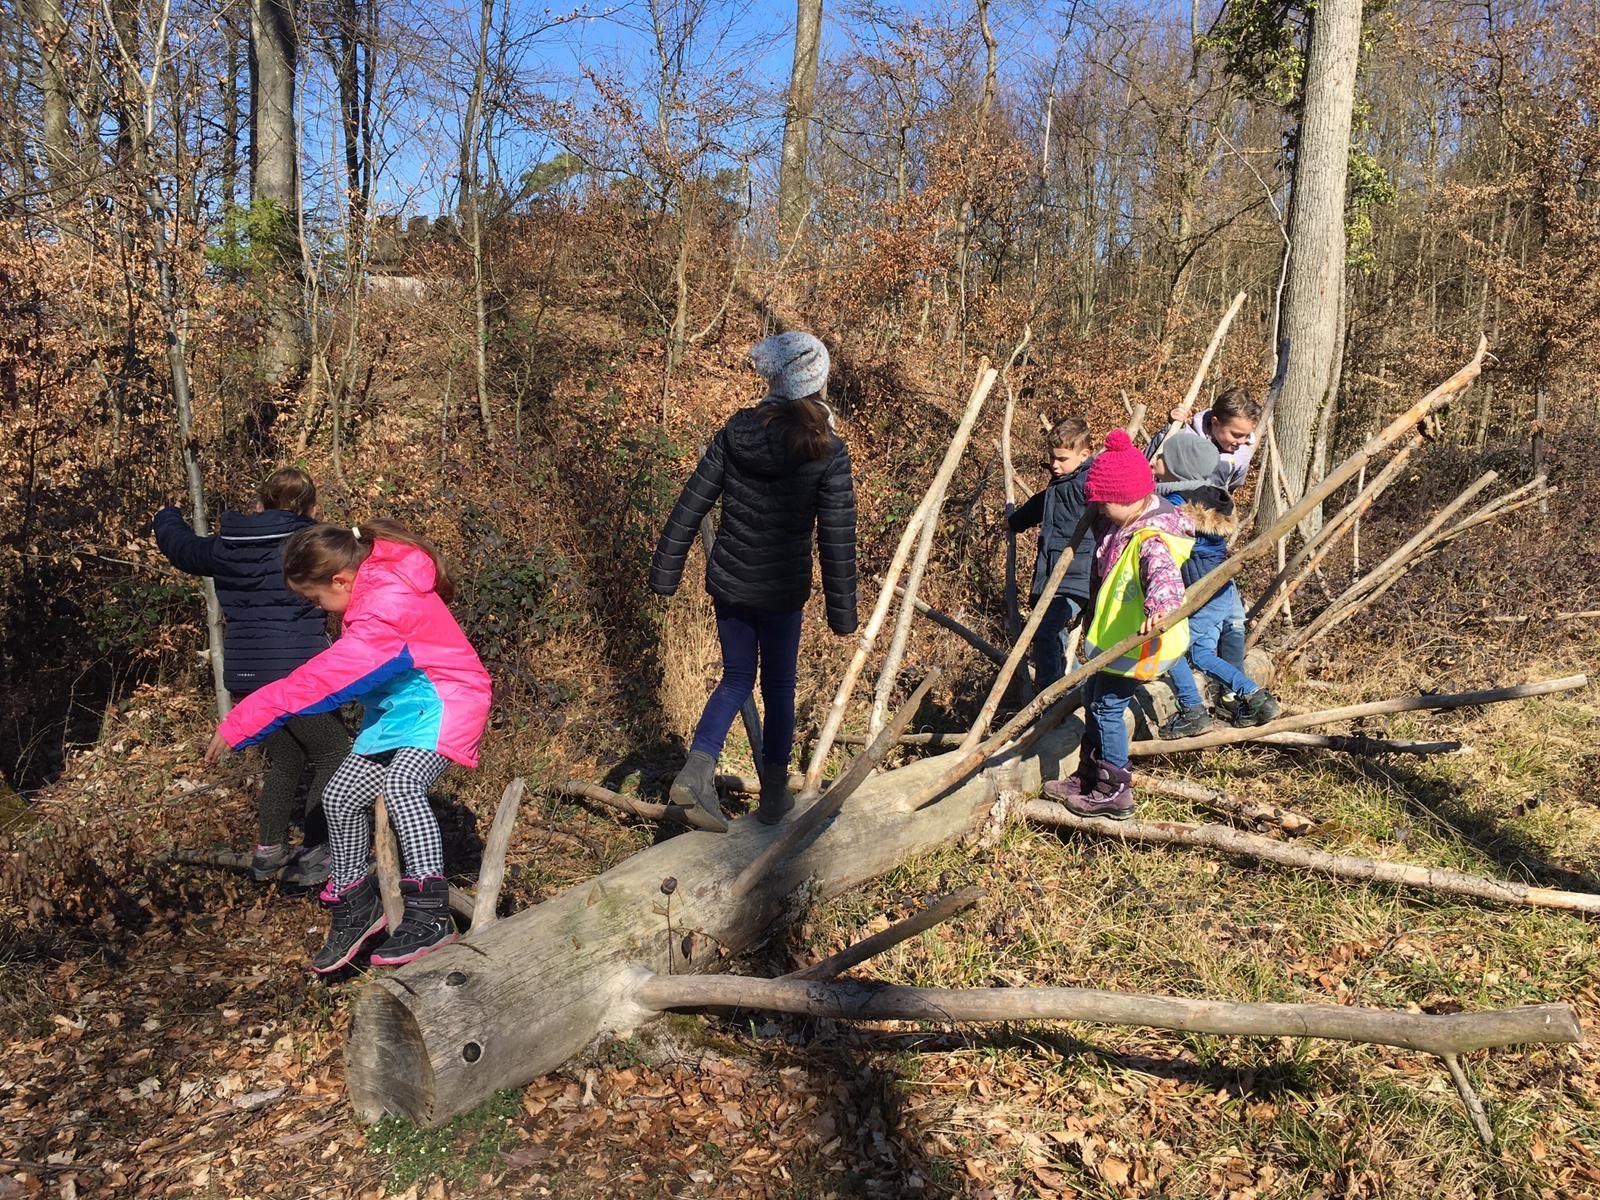 Wir lassen Bäume wachsen